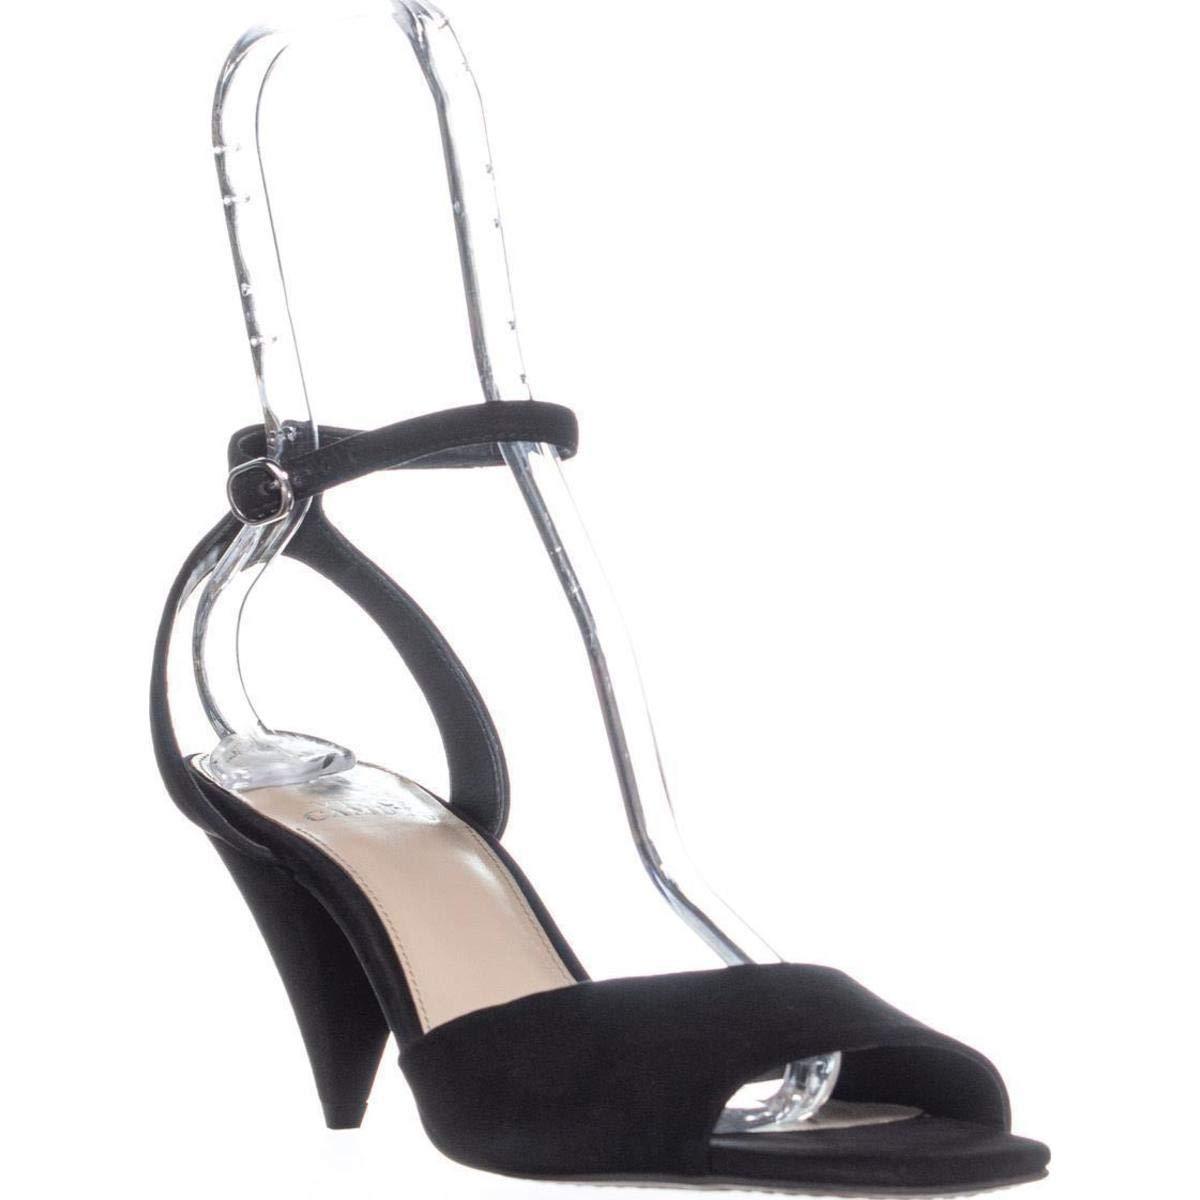 Black Vince Camuto Womens Benatta Nubuck Ankle Strap Dress Sandals